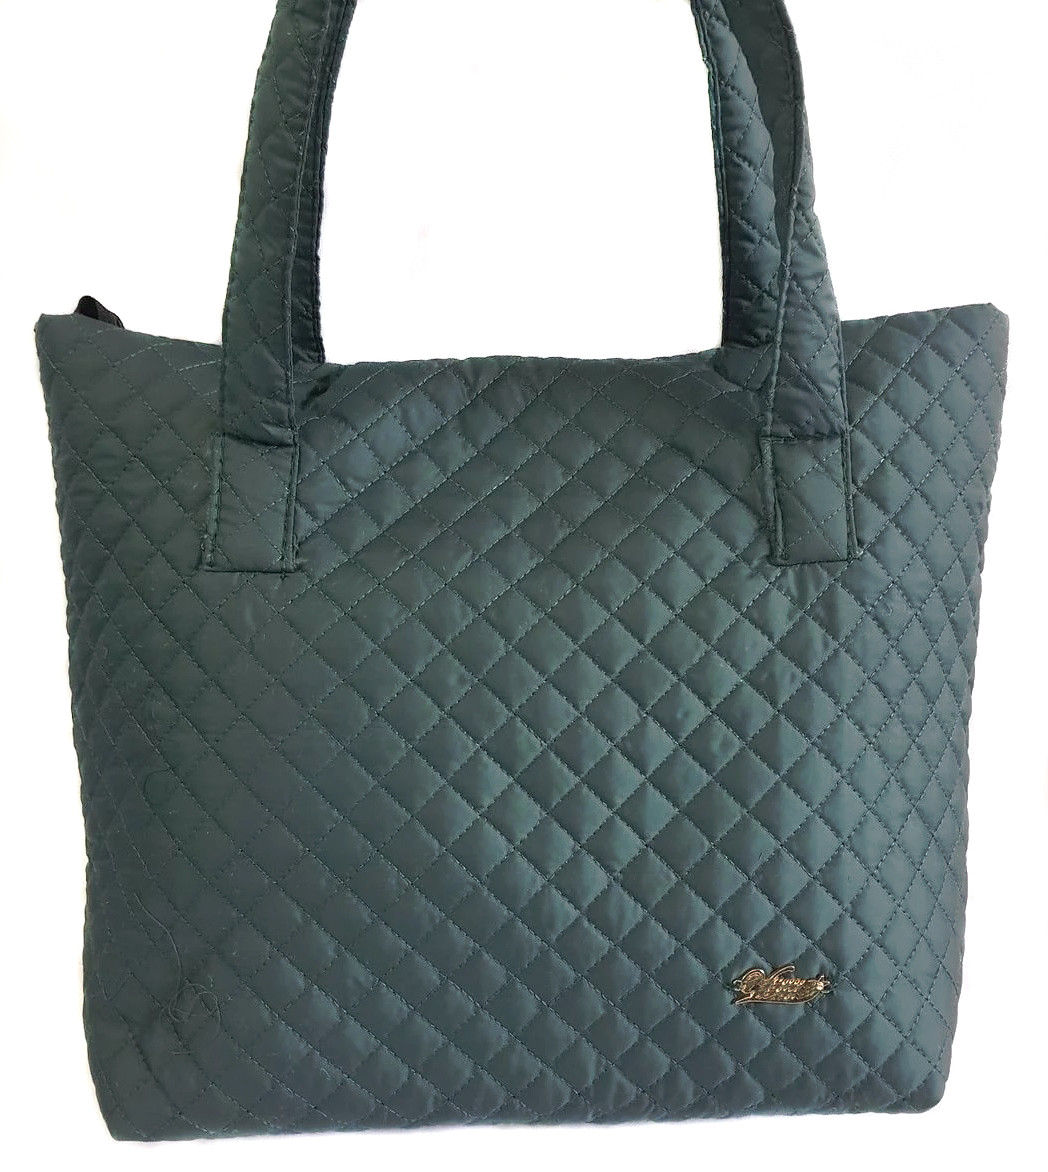 Дутая/стеганая зимняя женская сумка темно-зеленая 1100622844